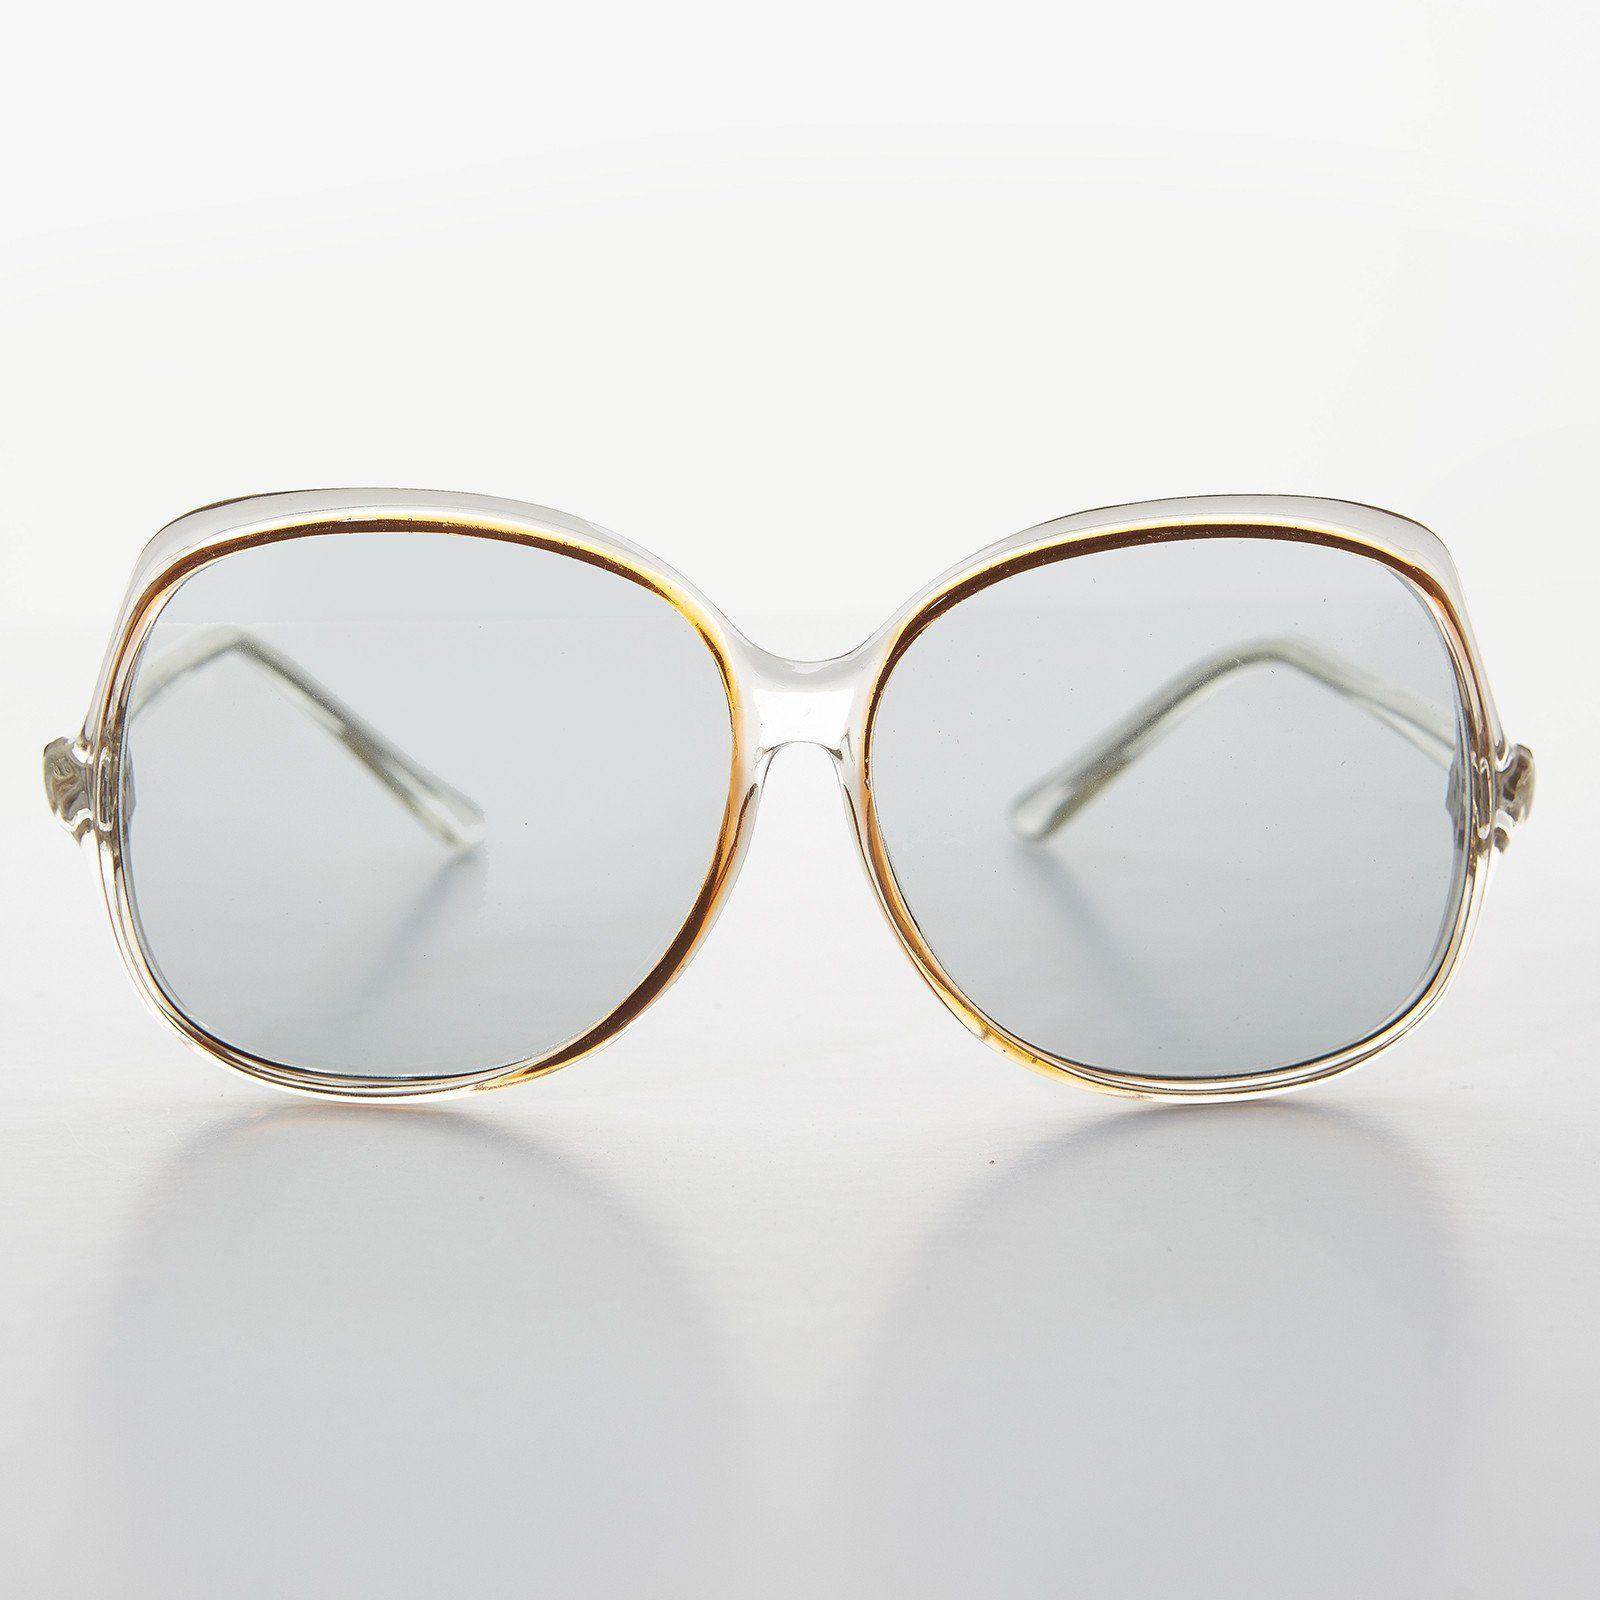 7afdba42c6 Jackie O Bohemian Oversized Vintage Sunglass with Transition Lens - Olivia